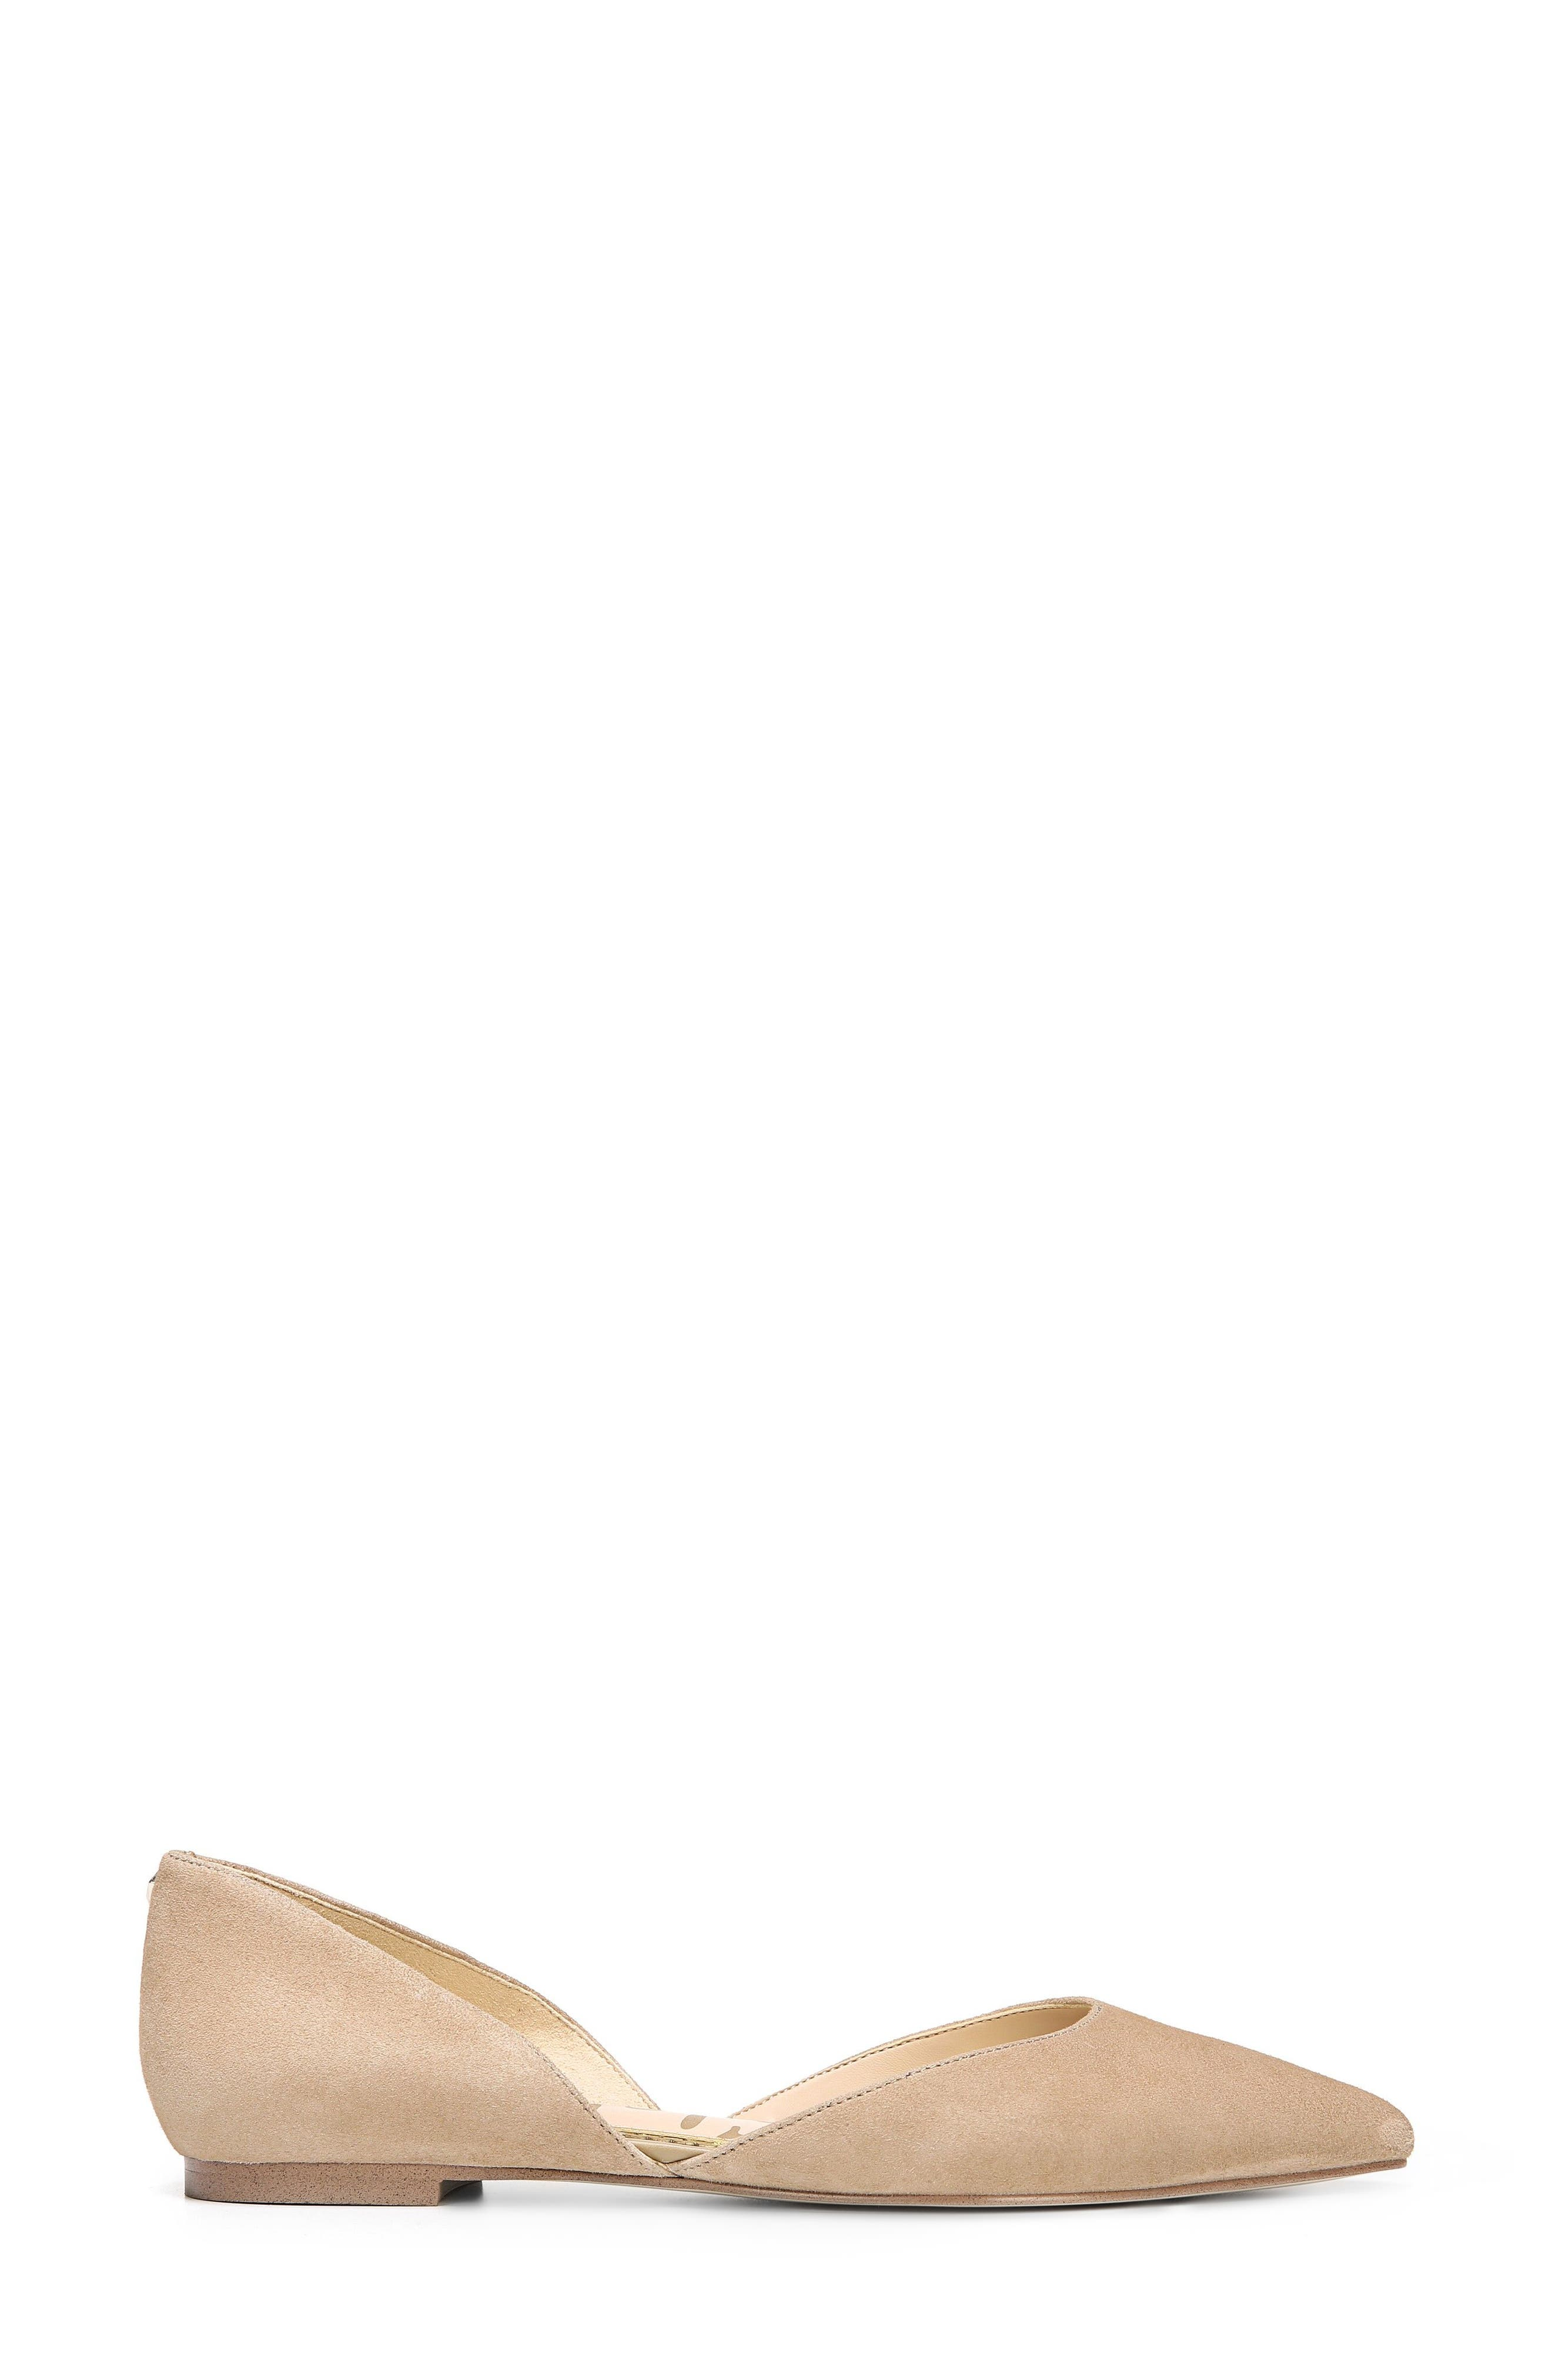 Alternate Image 3  - Sam Edelman Rodney Pointy Toe d'Orsay Flat (Women)